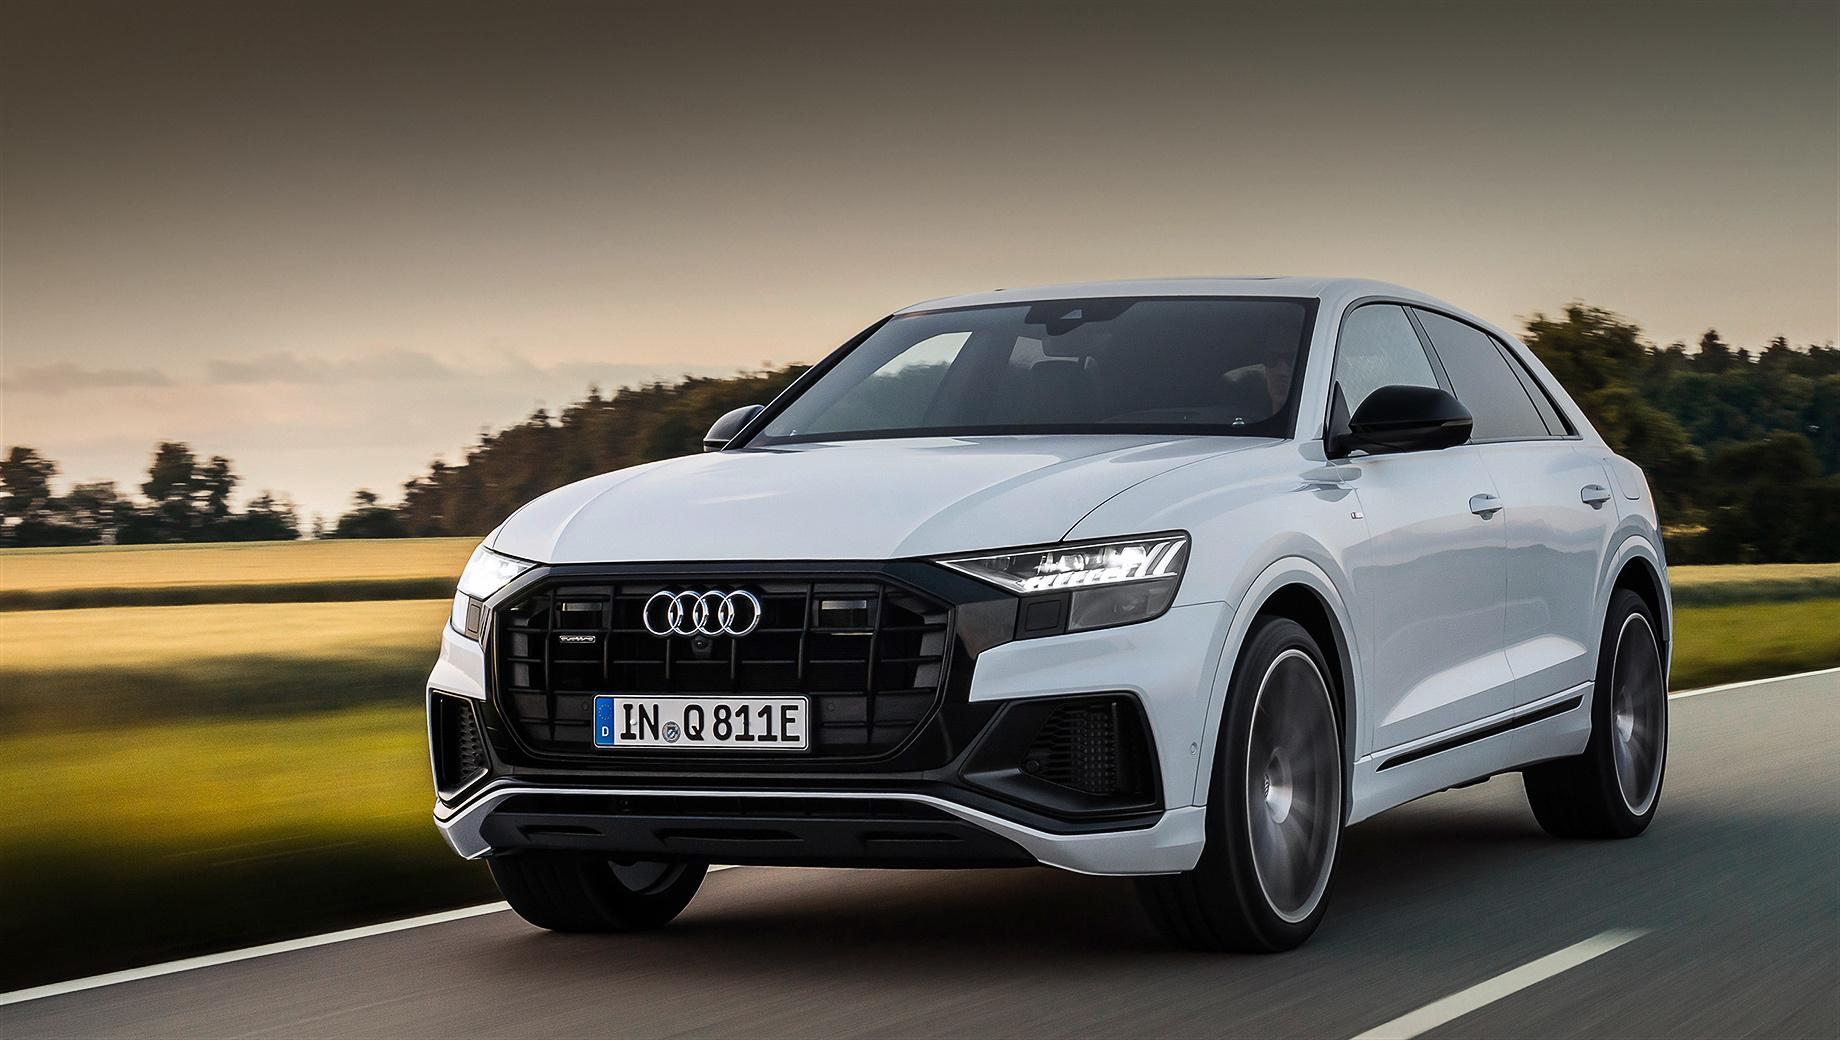 Стали известны характеристики гибрида Audi Q8 TFSI e quattro